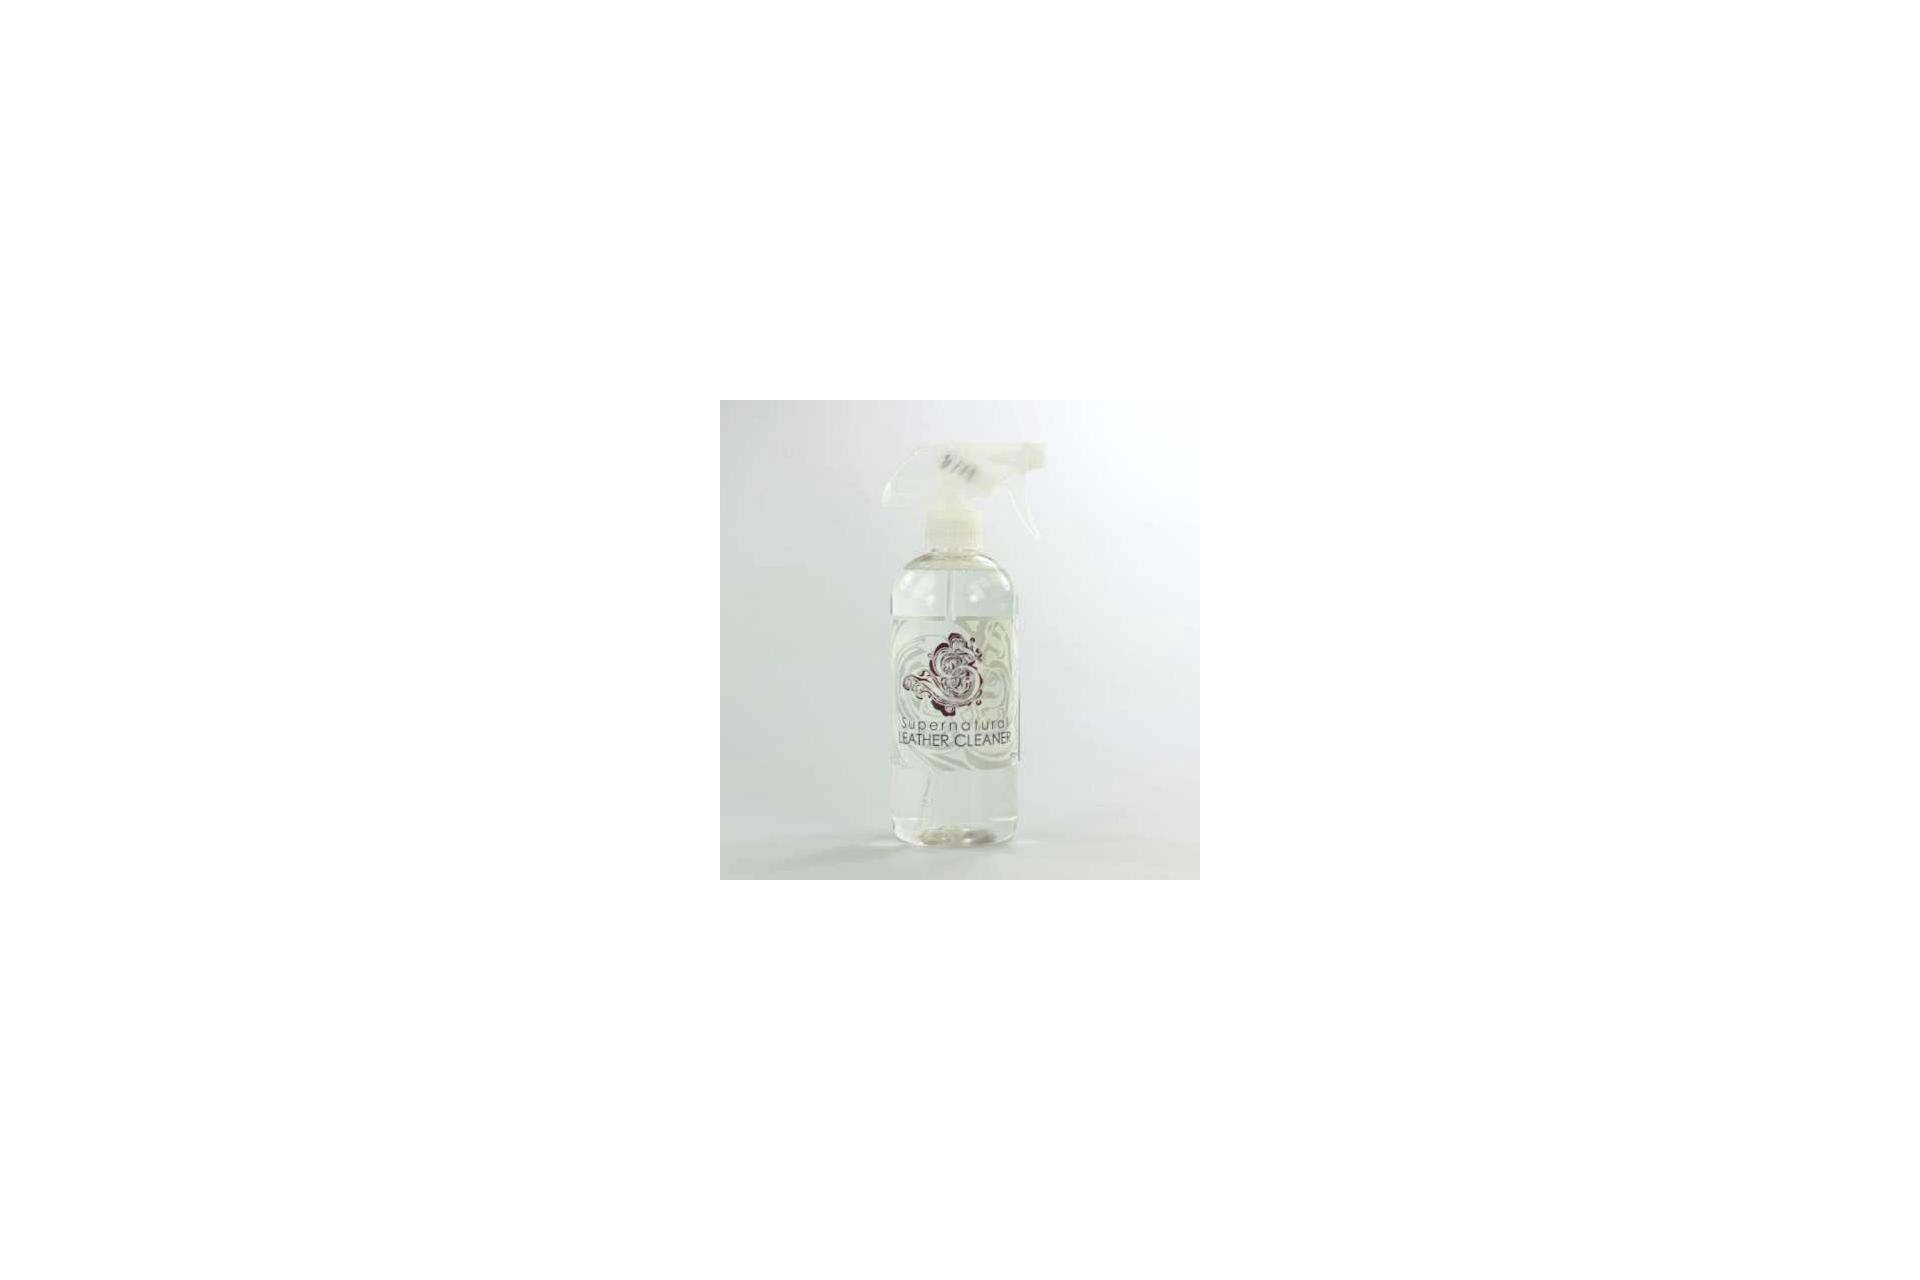 Dodo Juice Supernatural Leather Cleaner en bouteille de 500 ml